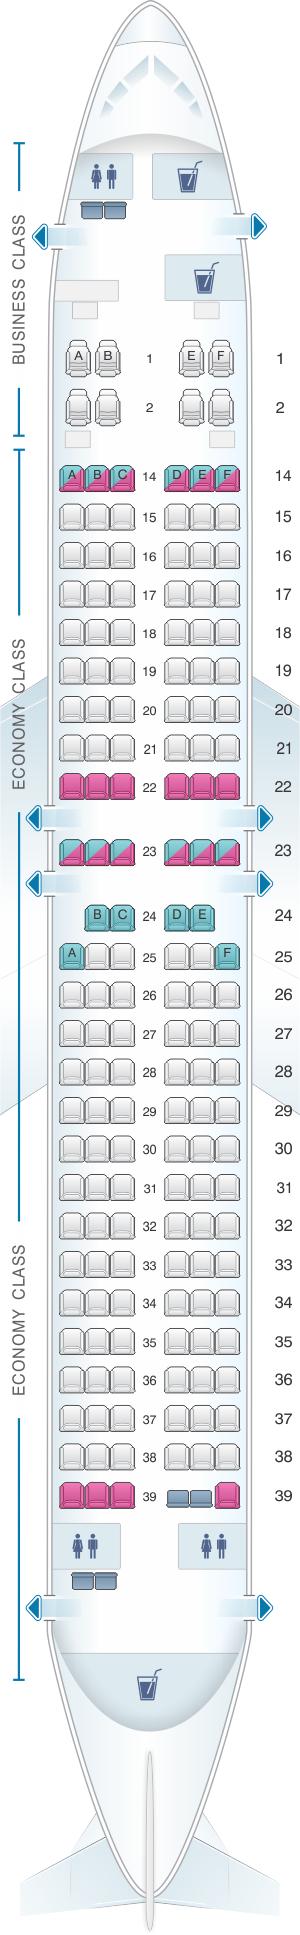 Seat map for Fiji Airways Boeing B737 800 164pax